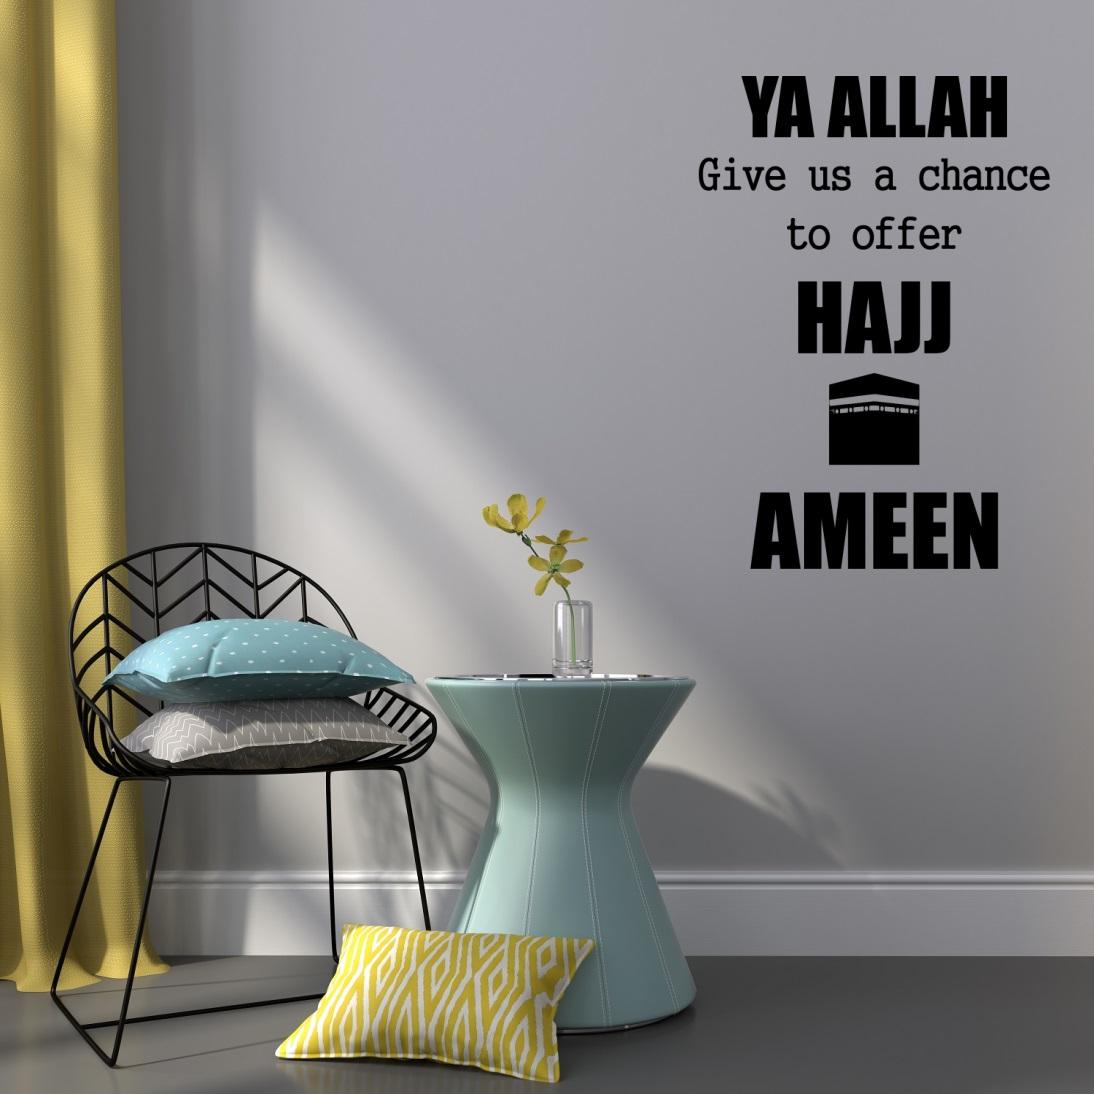 Ya Allah - Offer Hajj - Ameen - Islamic Wall Decal